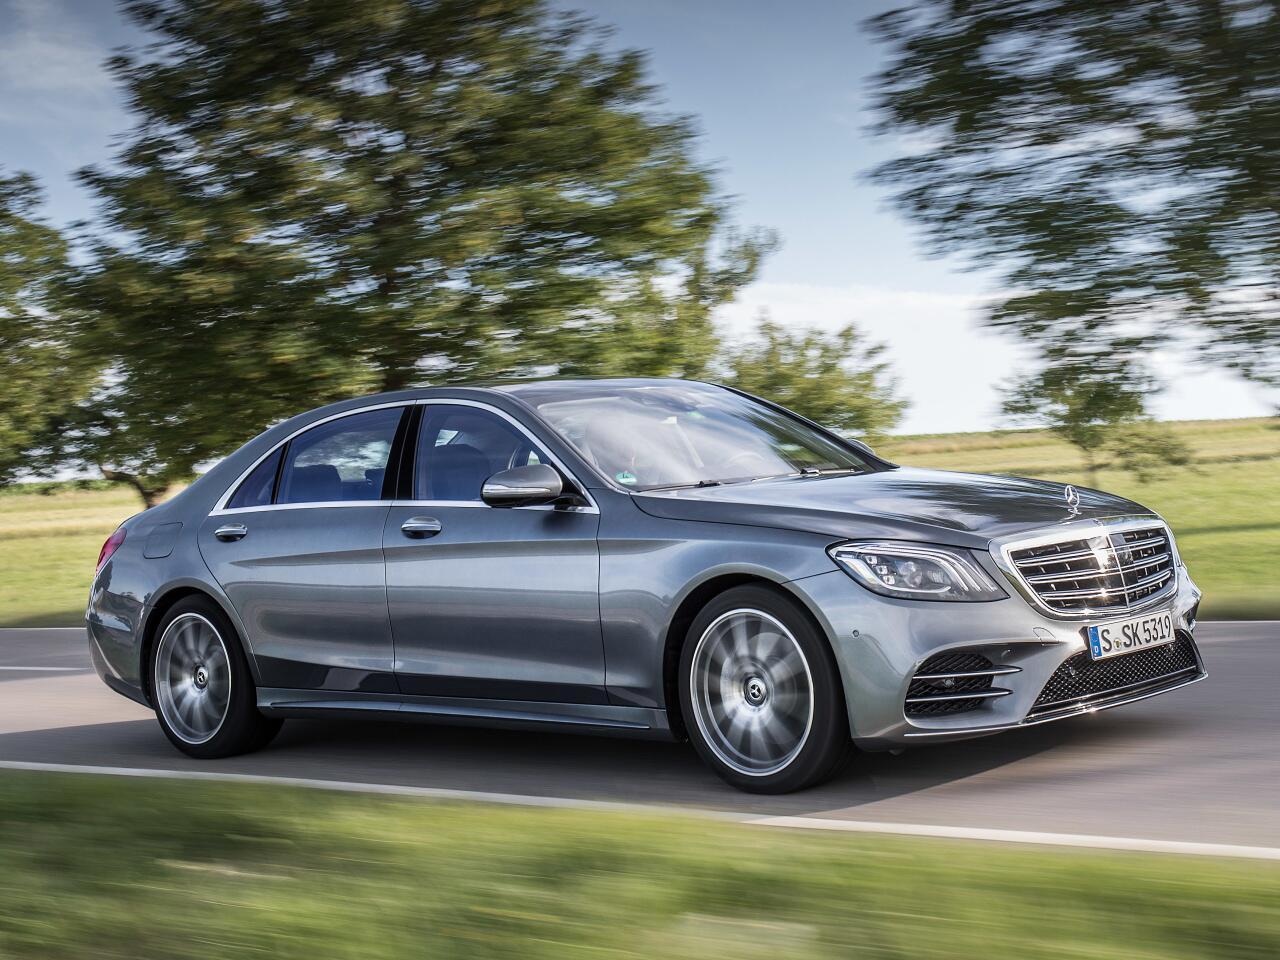 Bild zu Platz 7 - Modell: Mercedes-Benz S 350 CDI